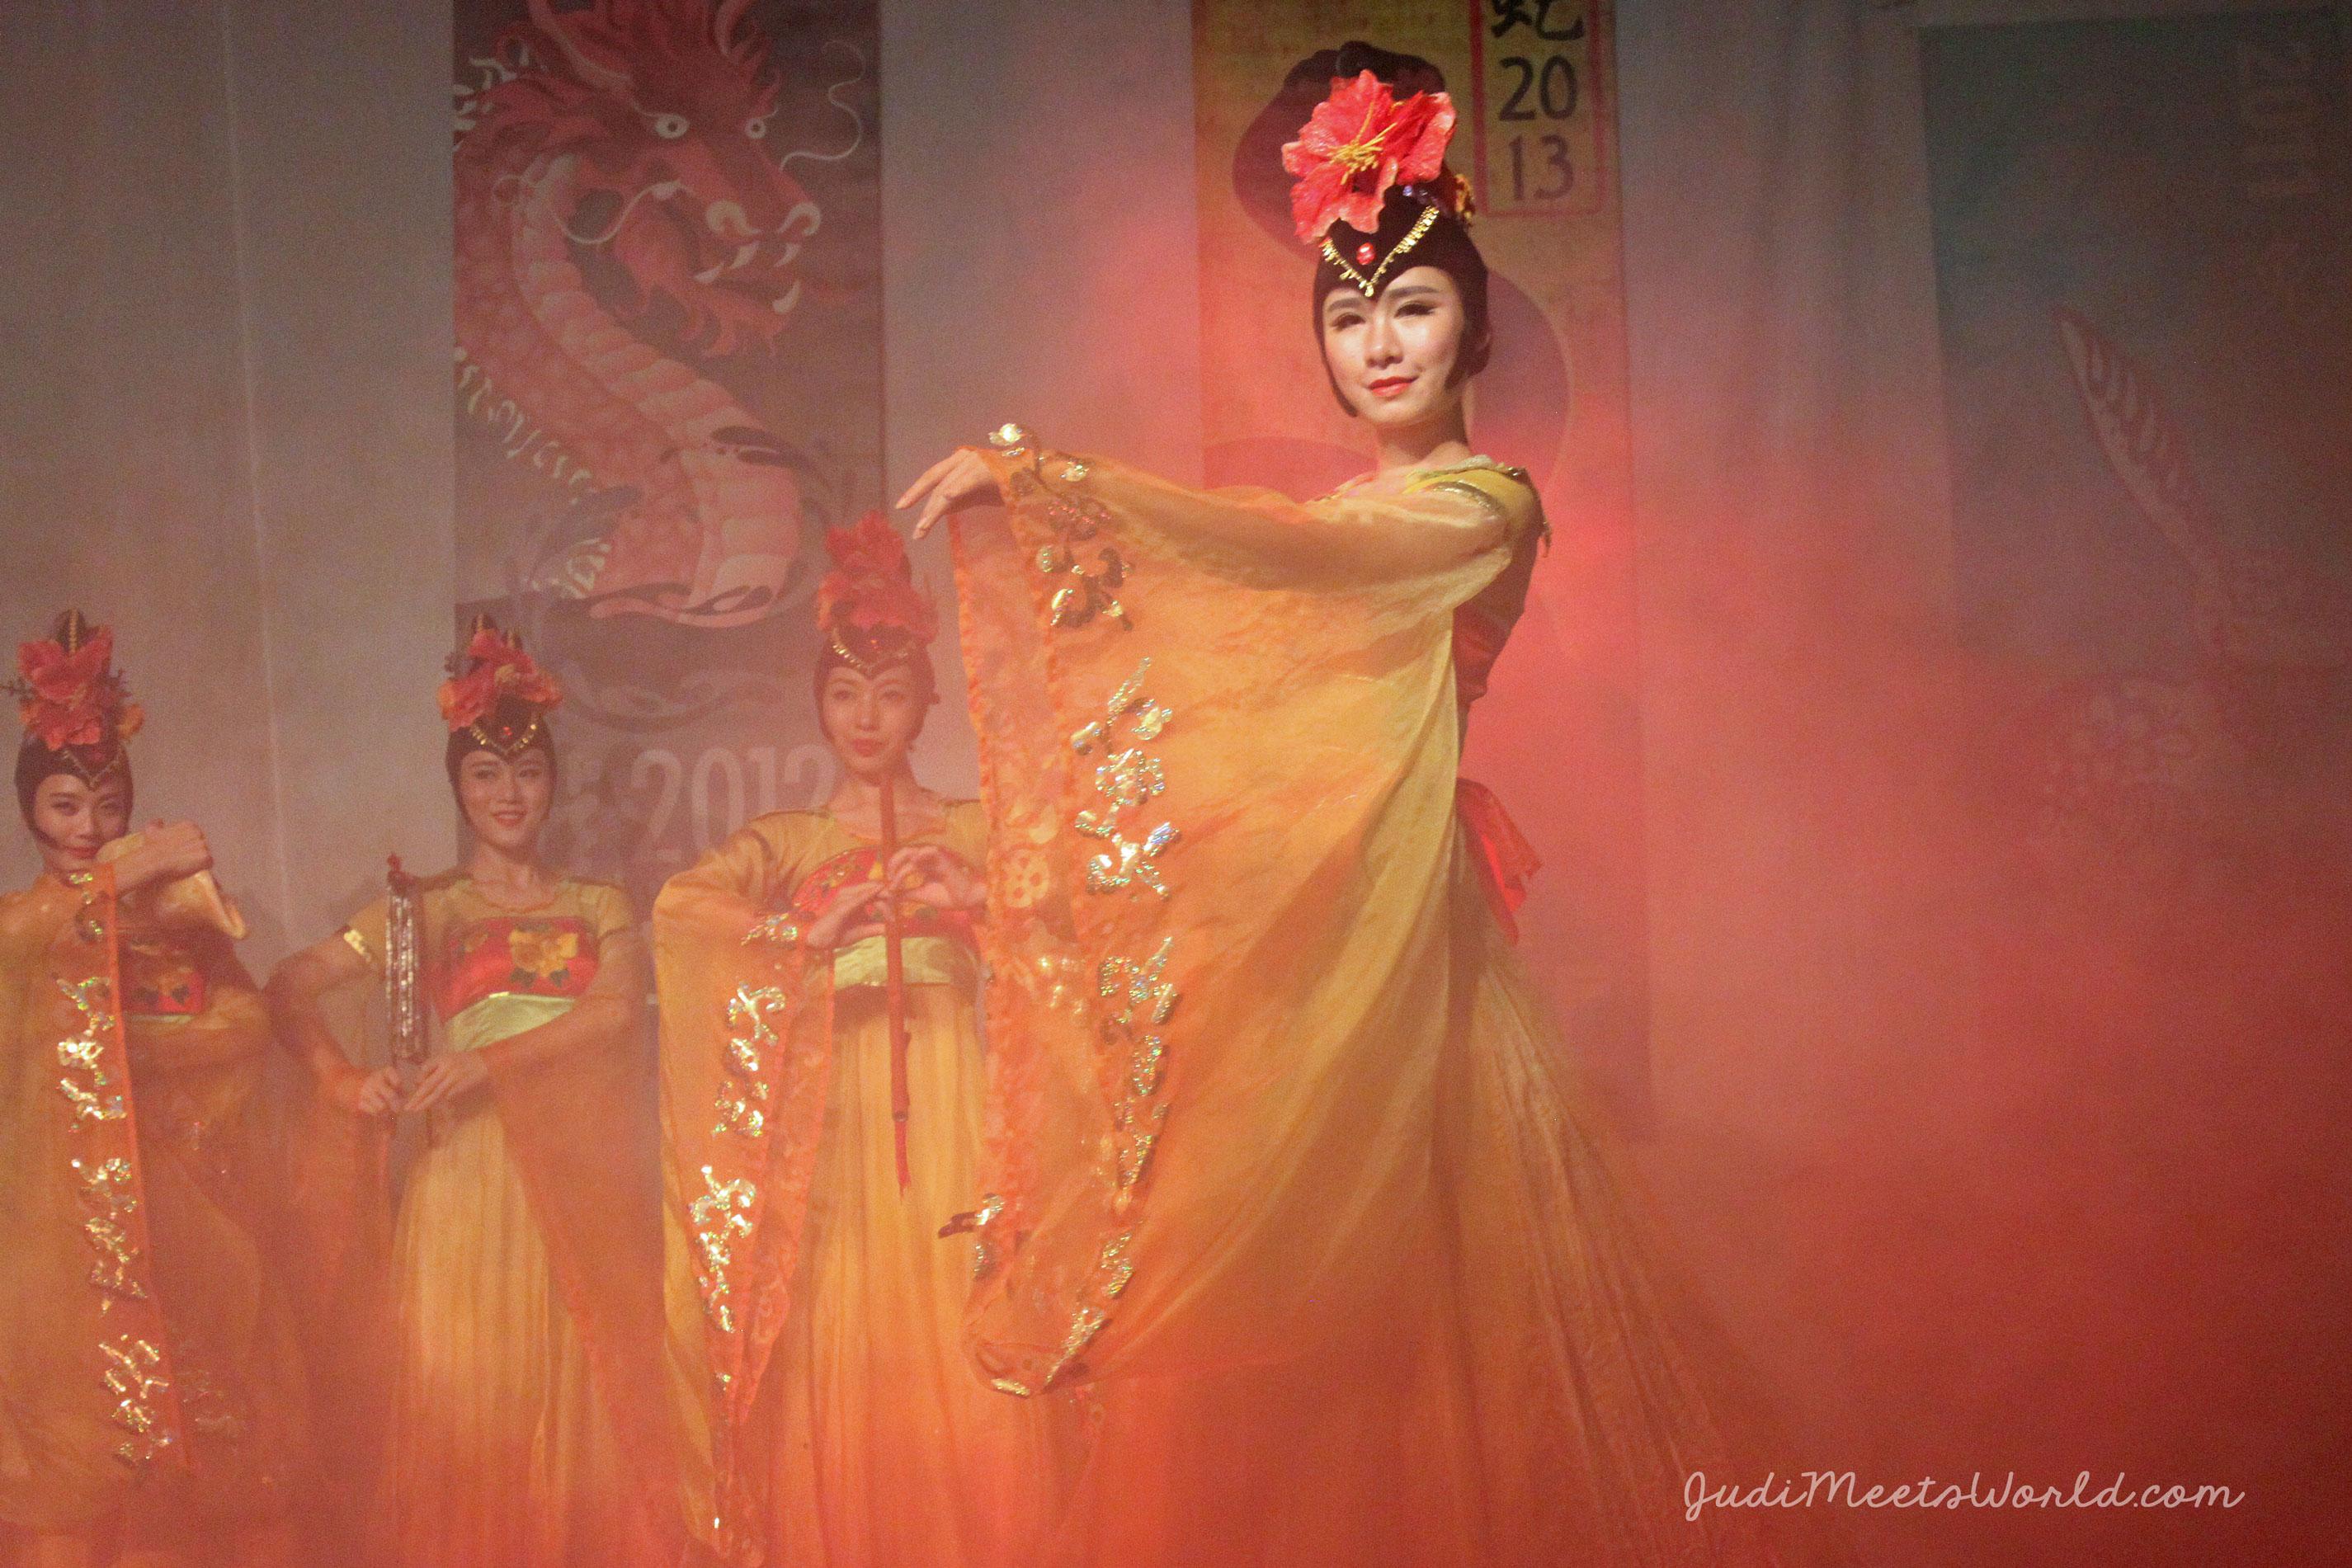 Meet the Chinese Pavilion. - judimeetsworld